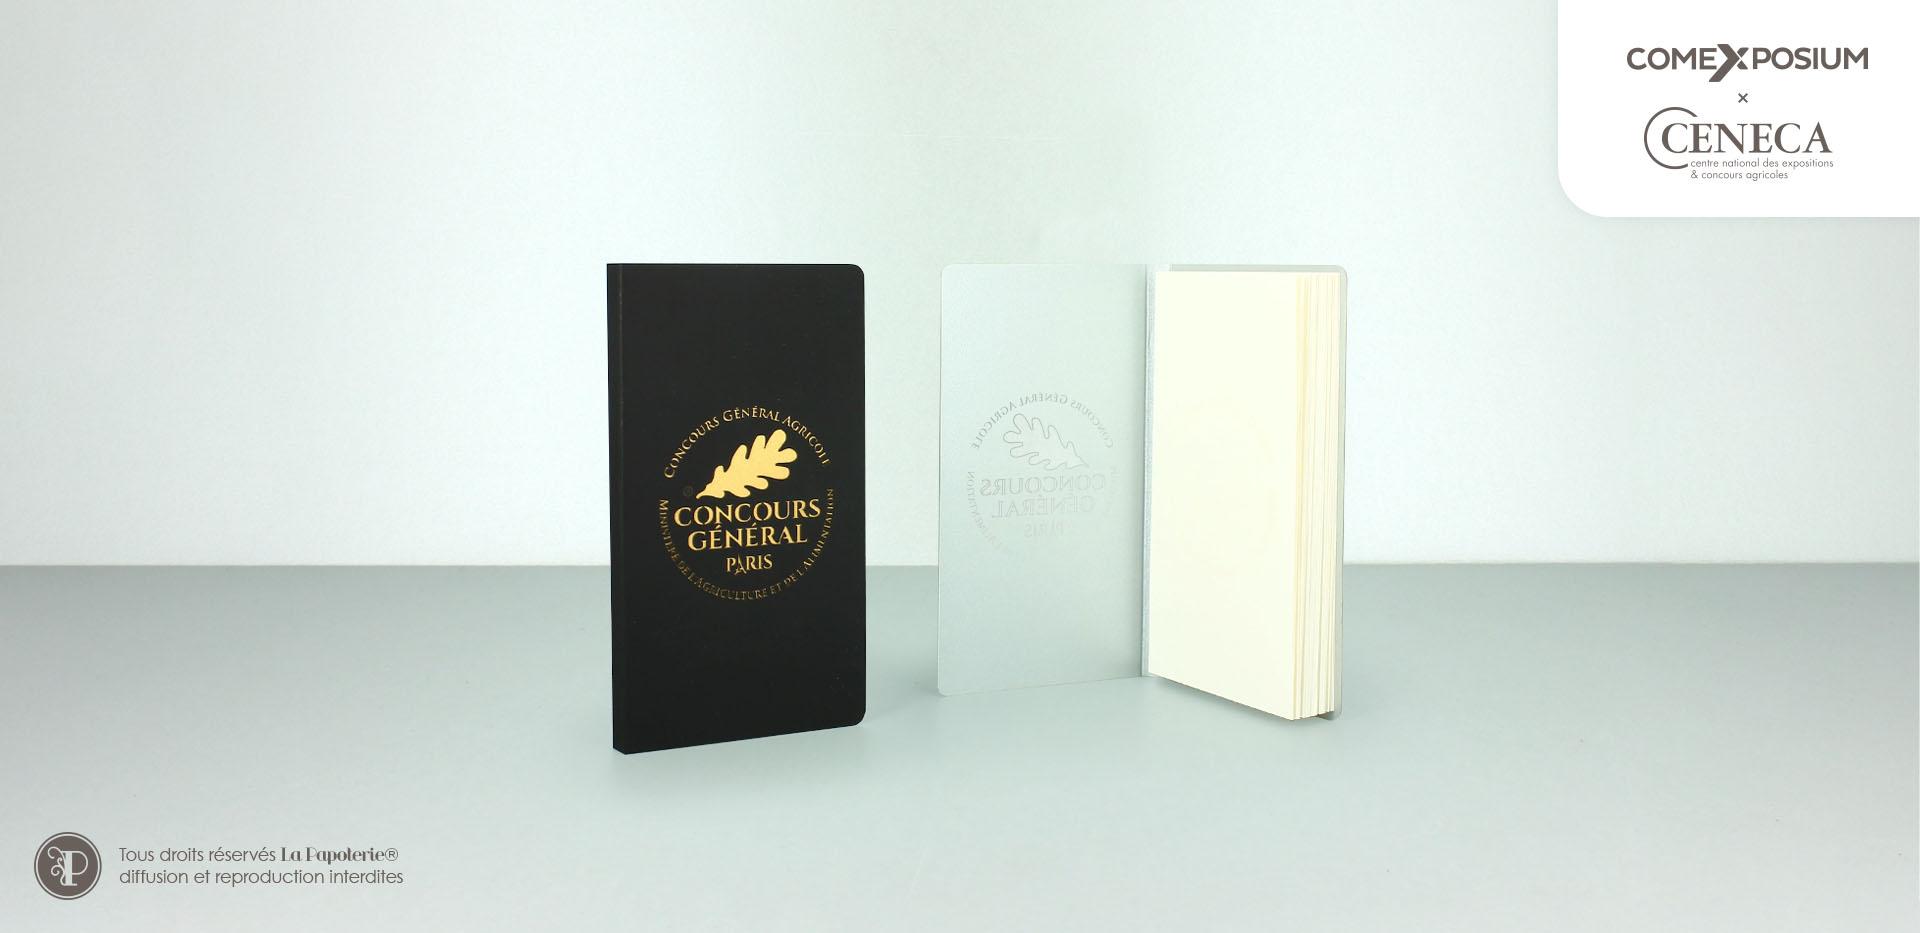 La Papoterie comexposium-duo-carnet-poche-2 Pocket notebook Comexposium Conconcours general agricole